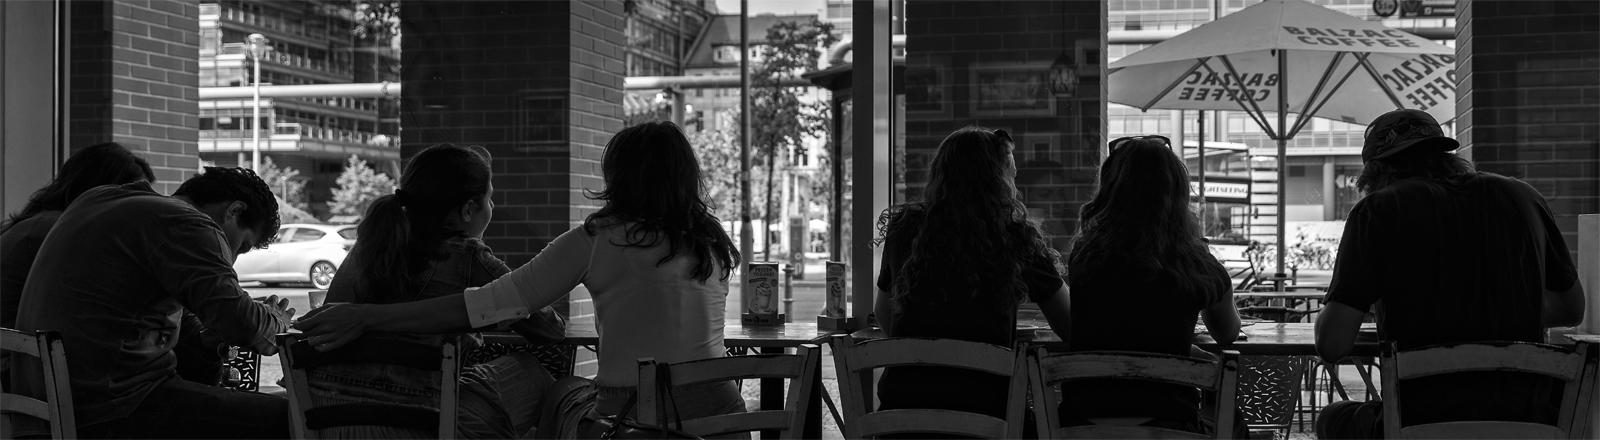 Coffeeshop in Berlin